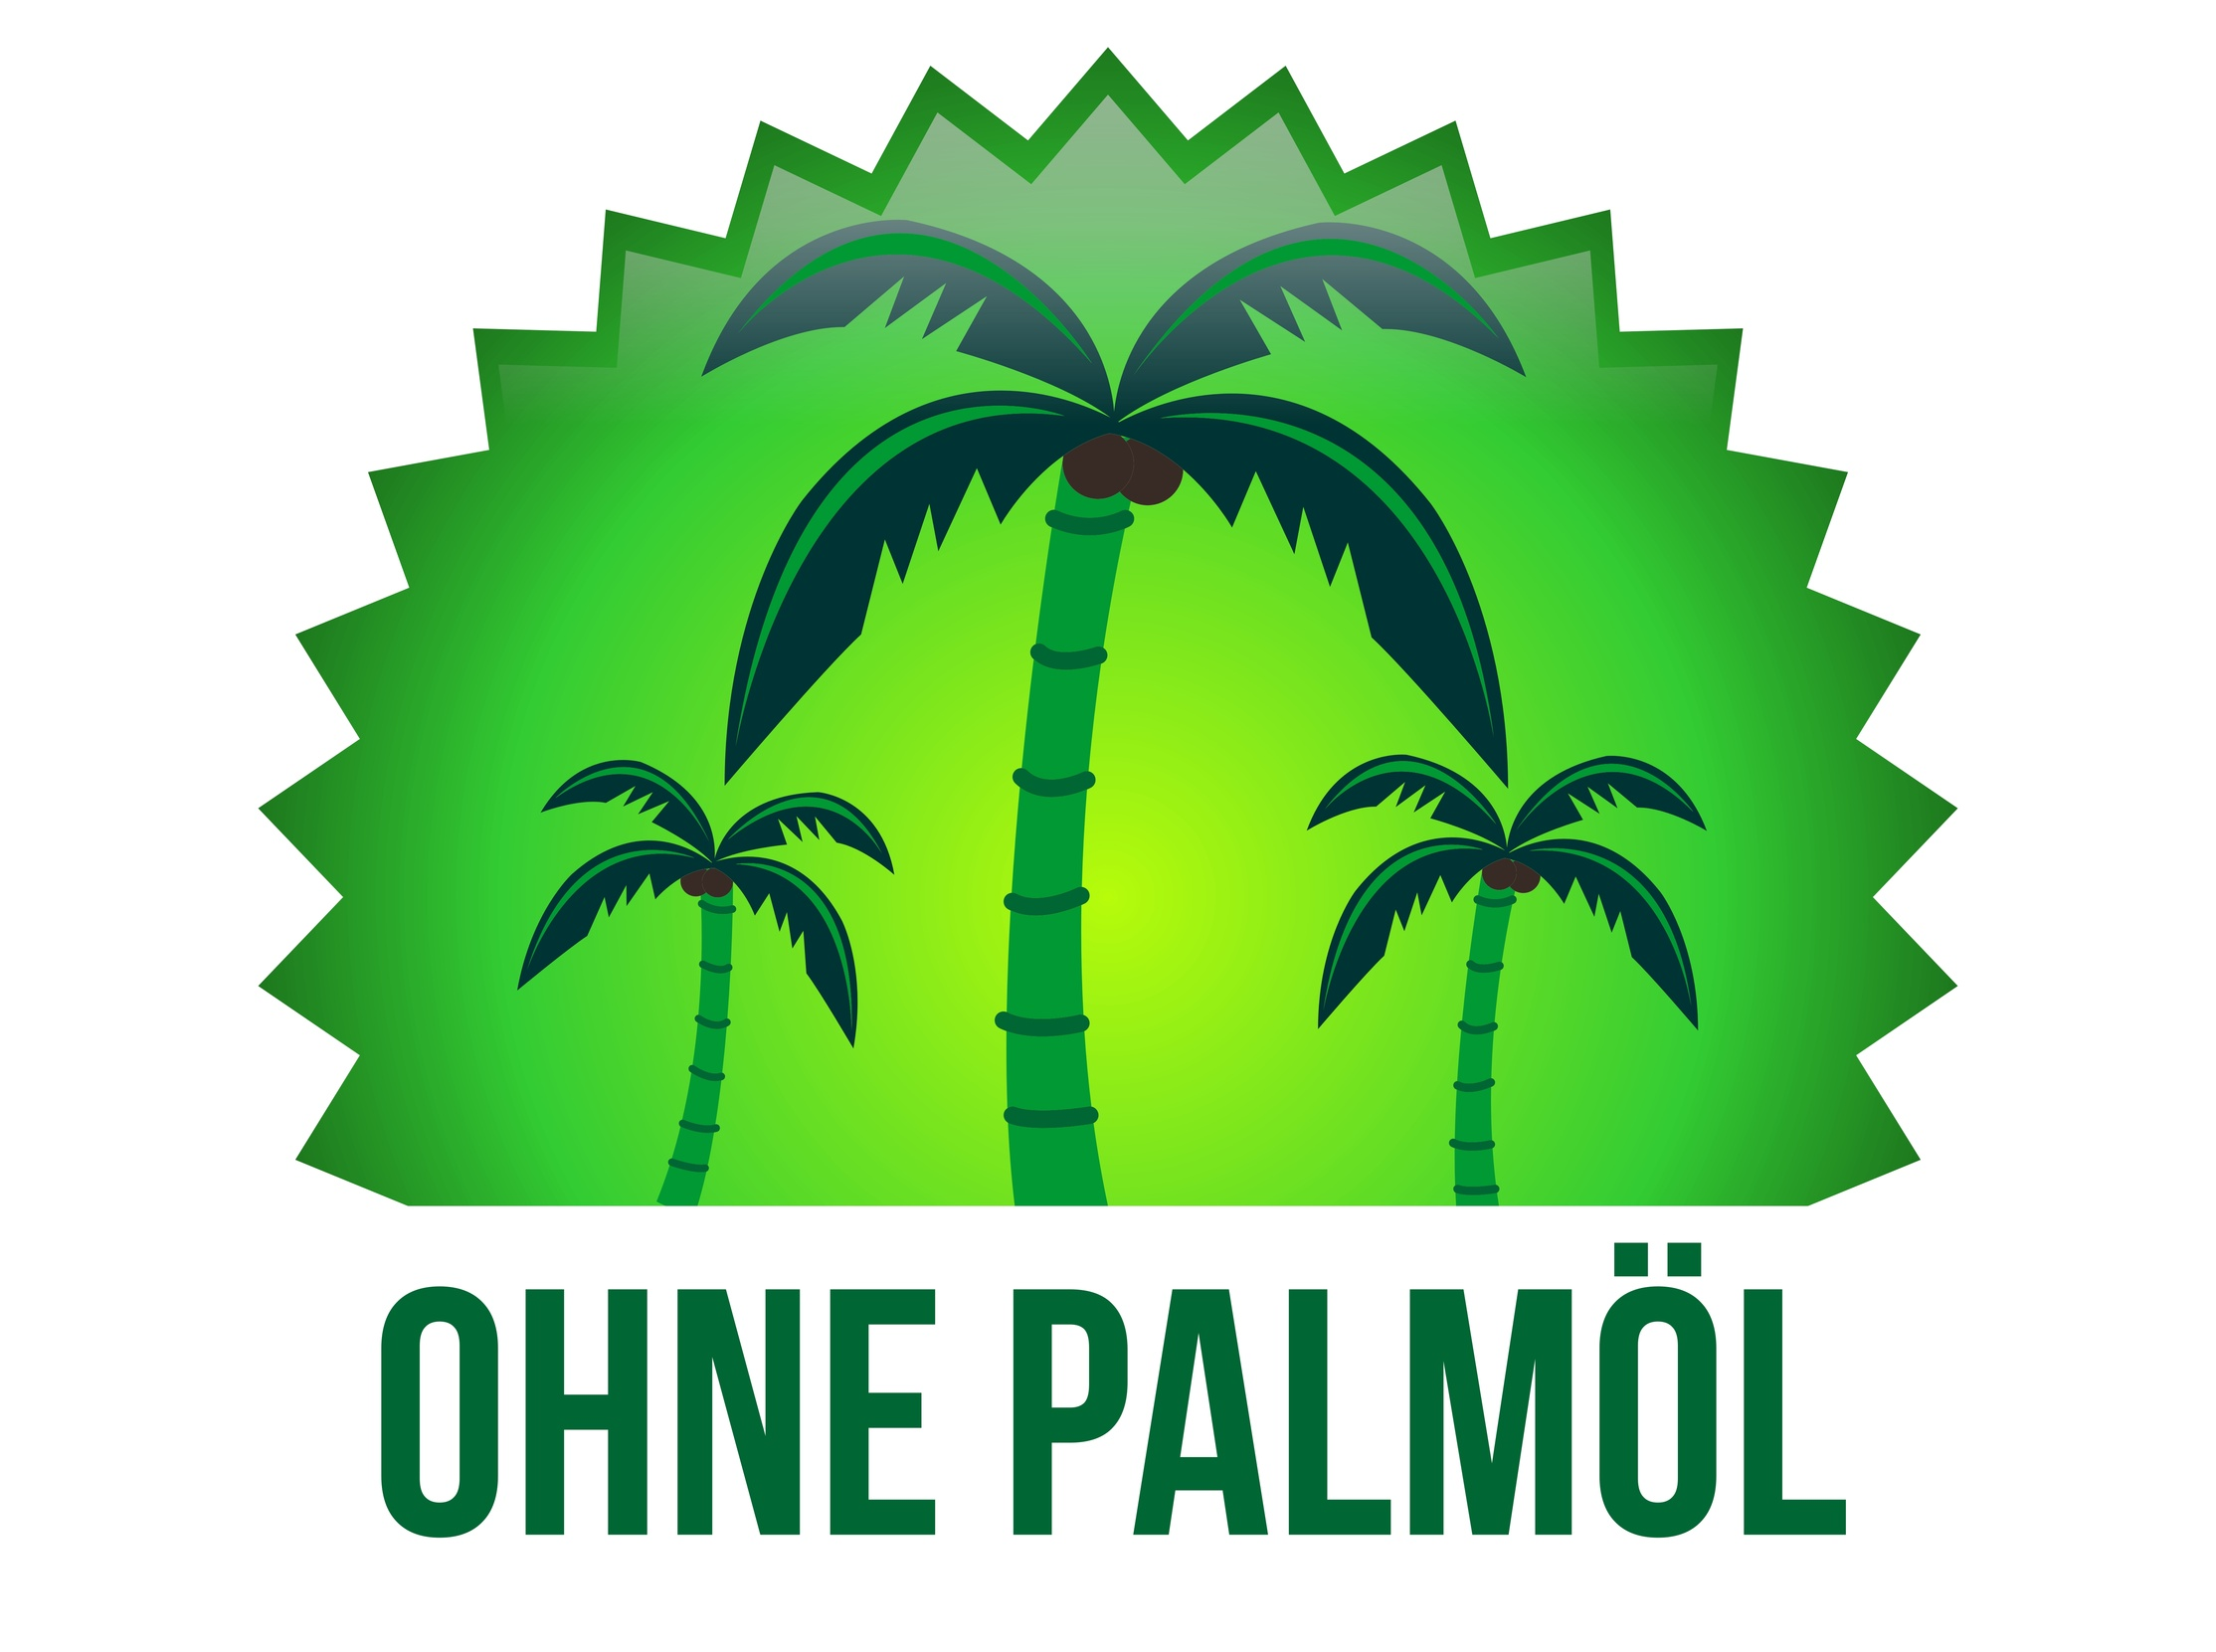 palmölfreie Kosmetik, ohne Palmöl, Mass-Balance